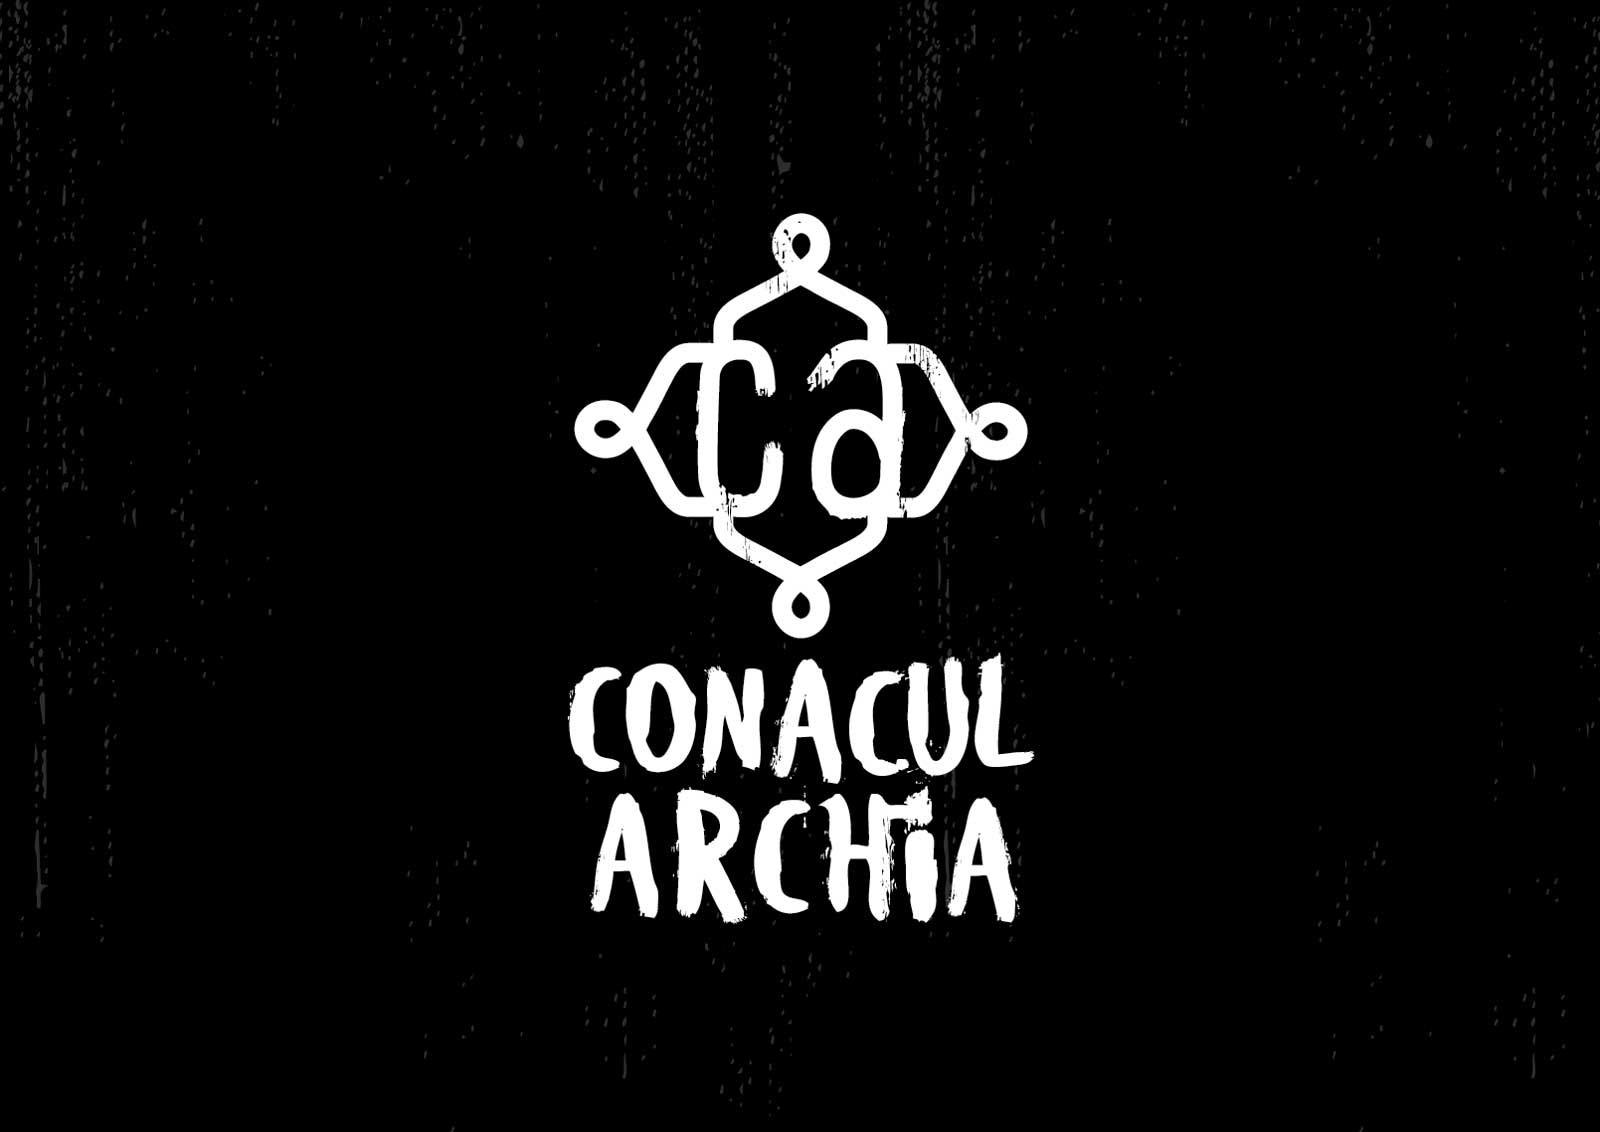 proiect inoveo concept conacul archia logo negativ